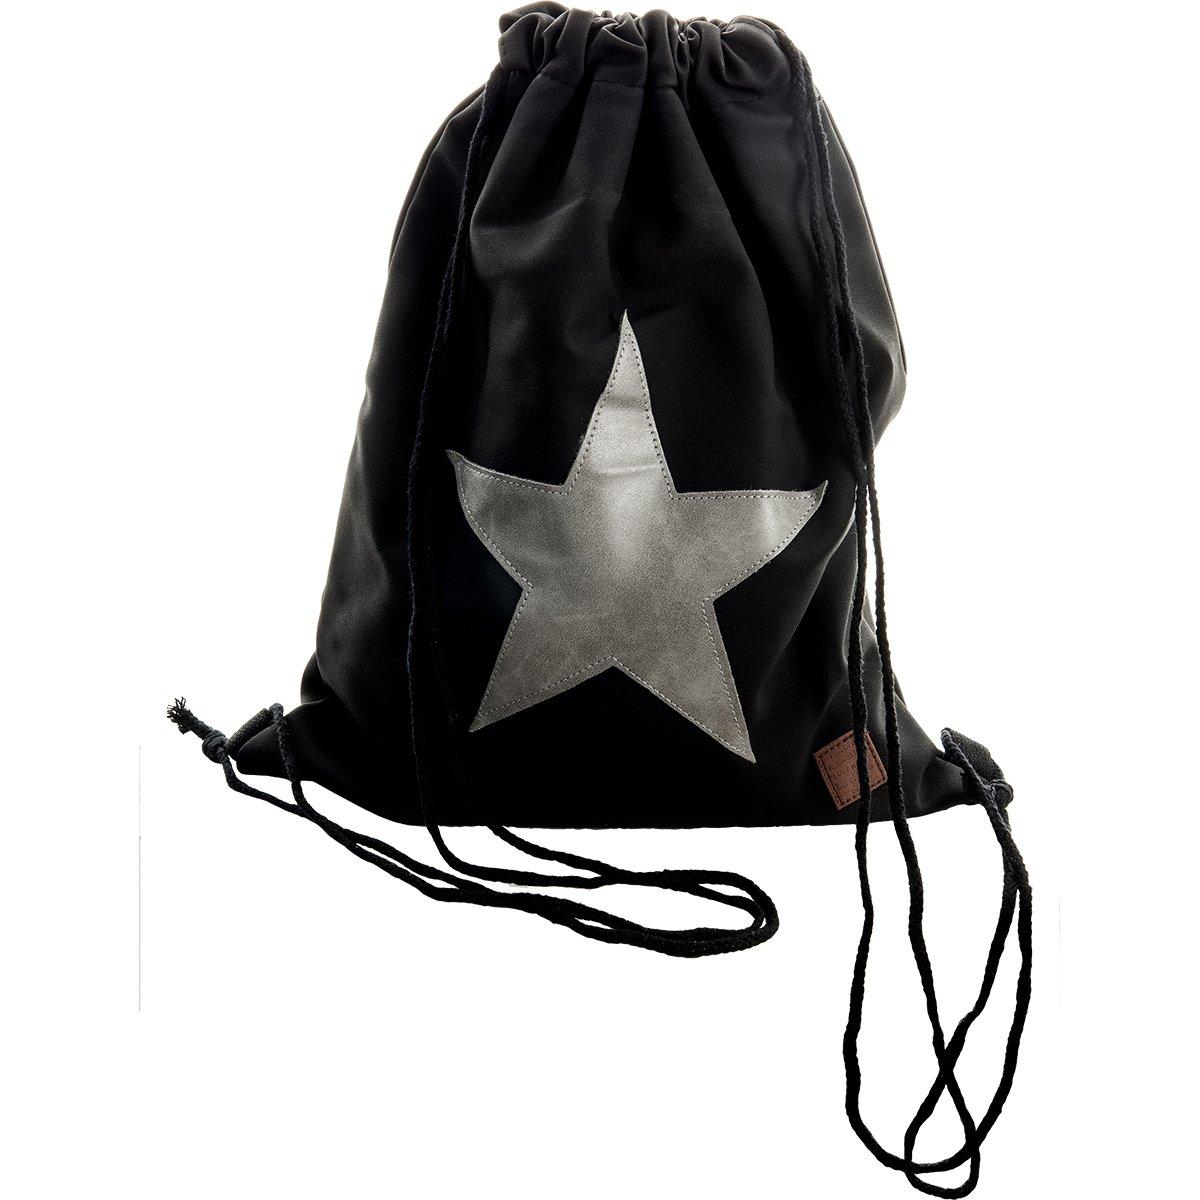 Bolsa de gimnasio con estrella cosida, mochila, Braun mit hellbraunem Stern hats